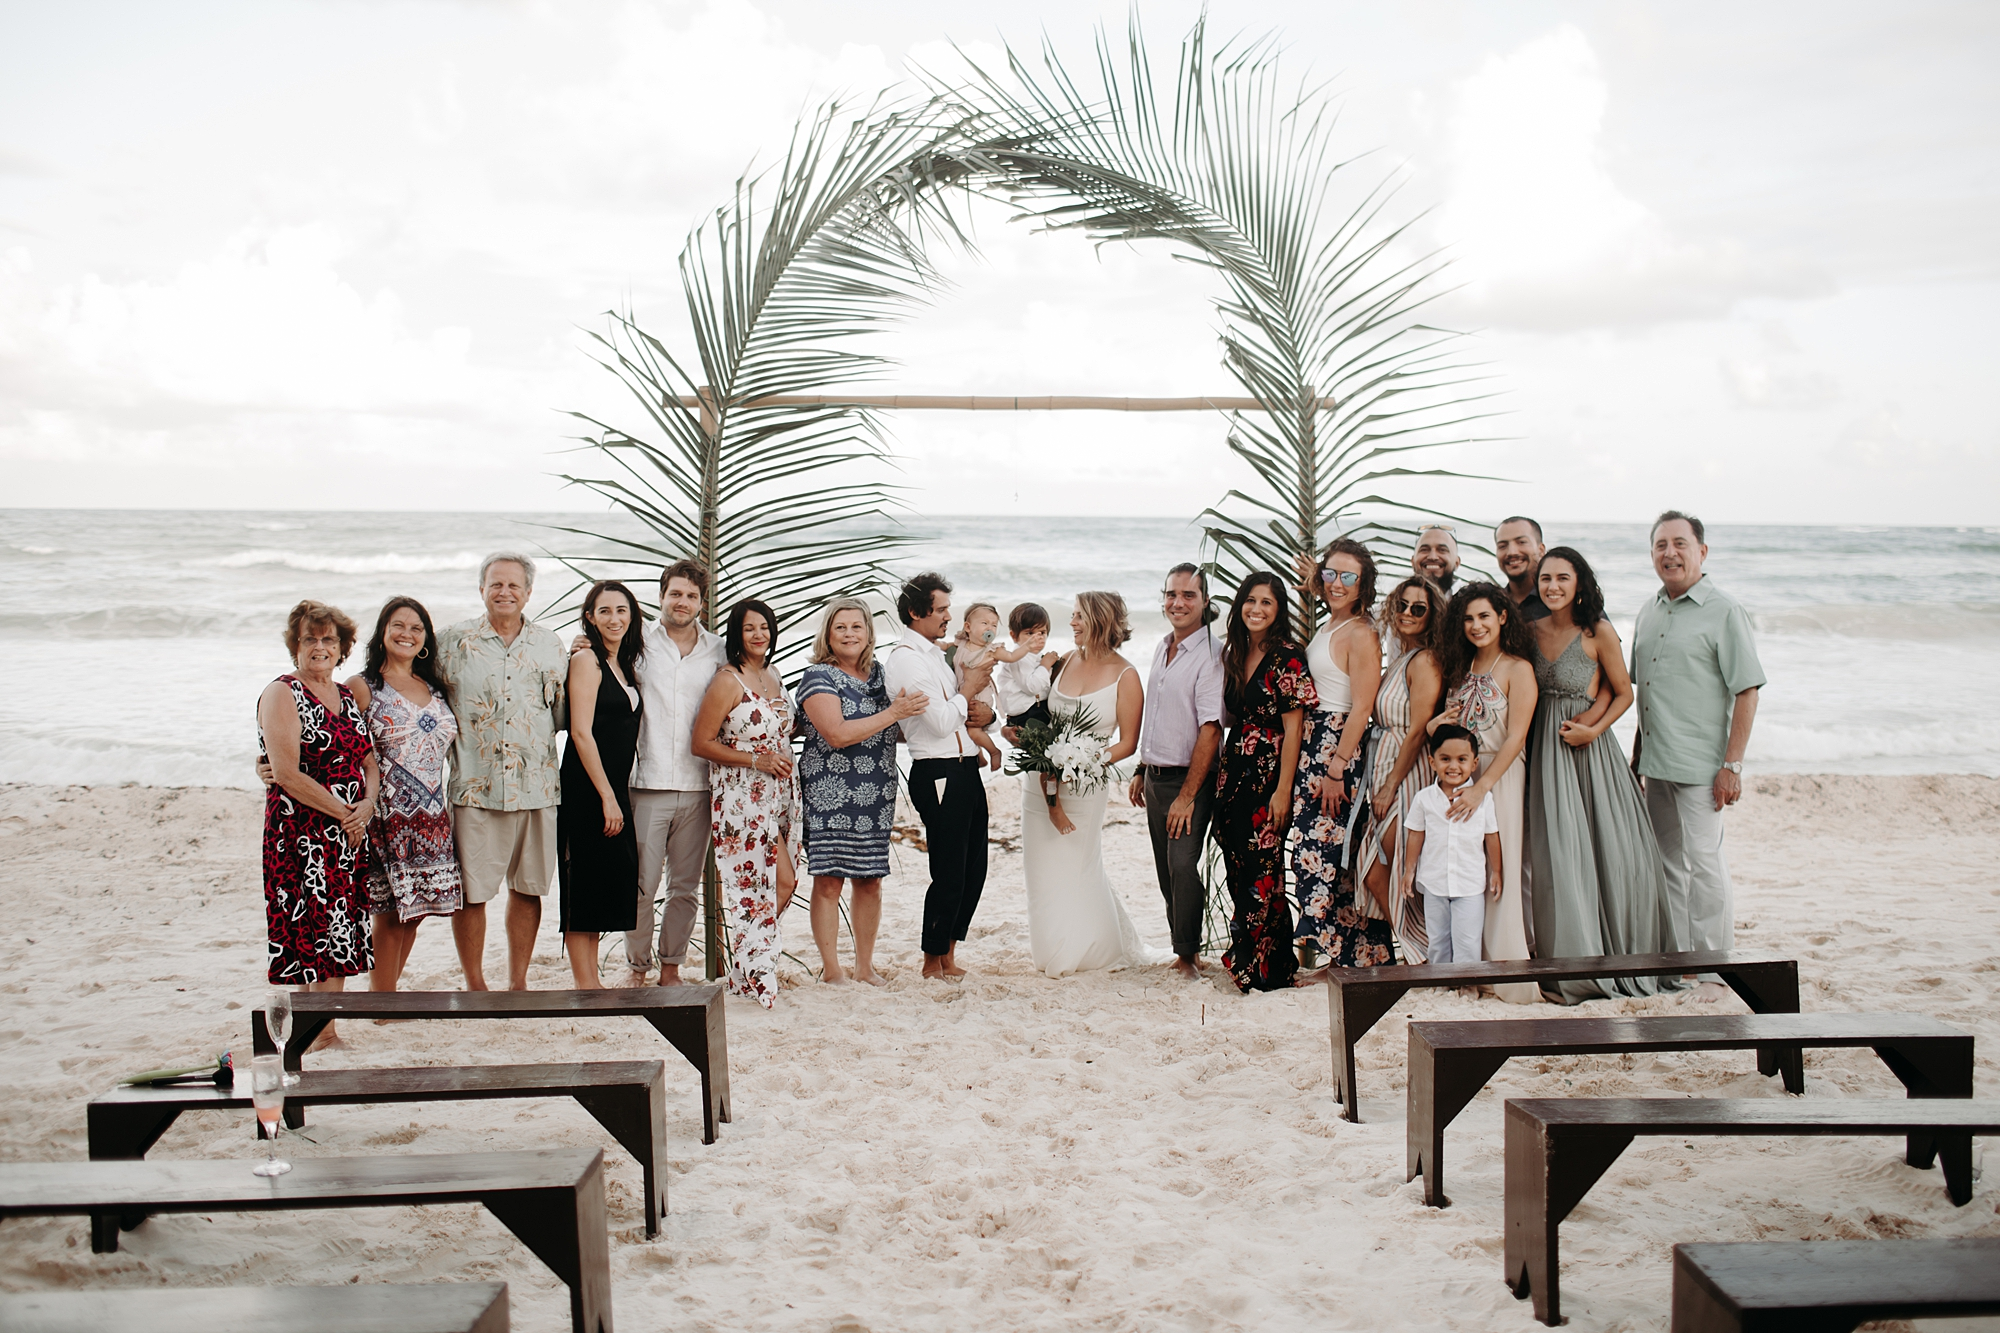 Danielle-San-Antonio-Wedding-Photographer-191_WEB.jpg